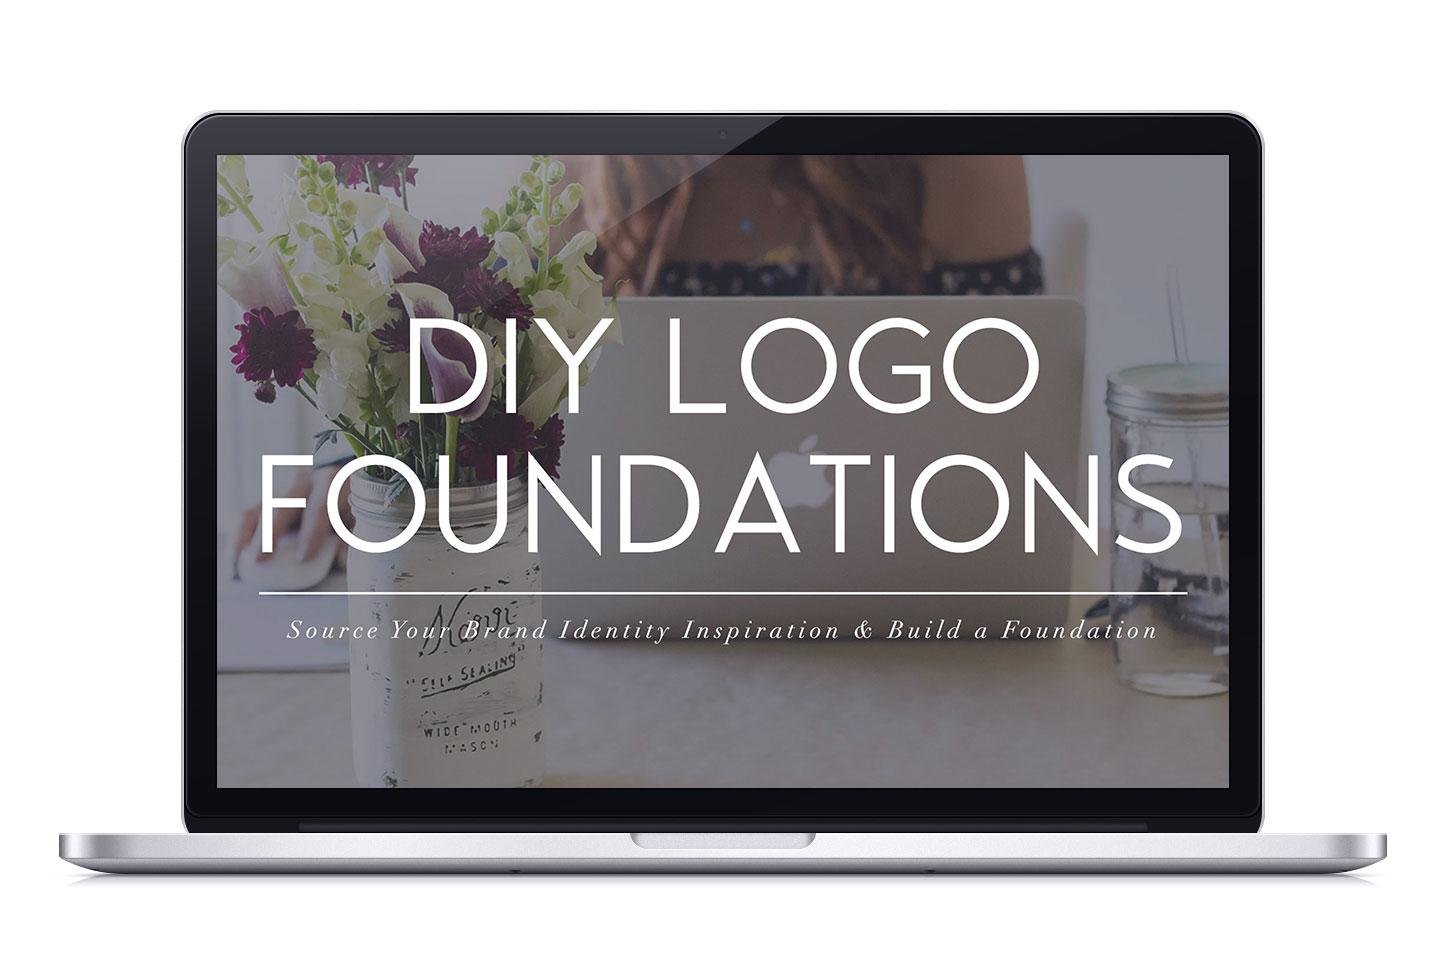 diy-logo-foundations-computer